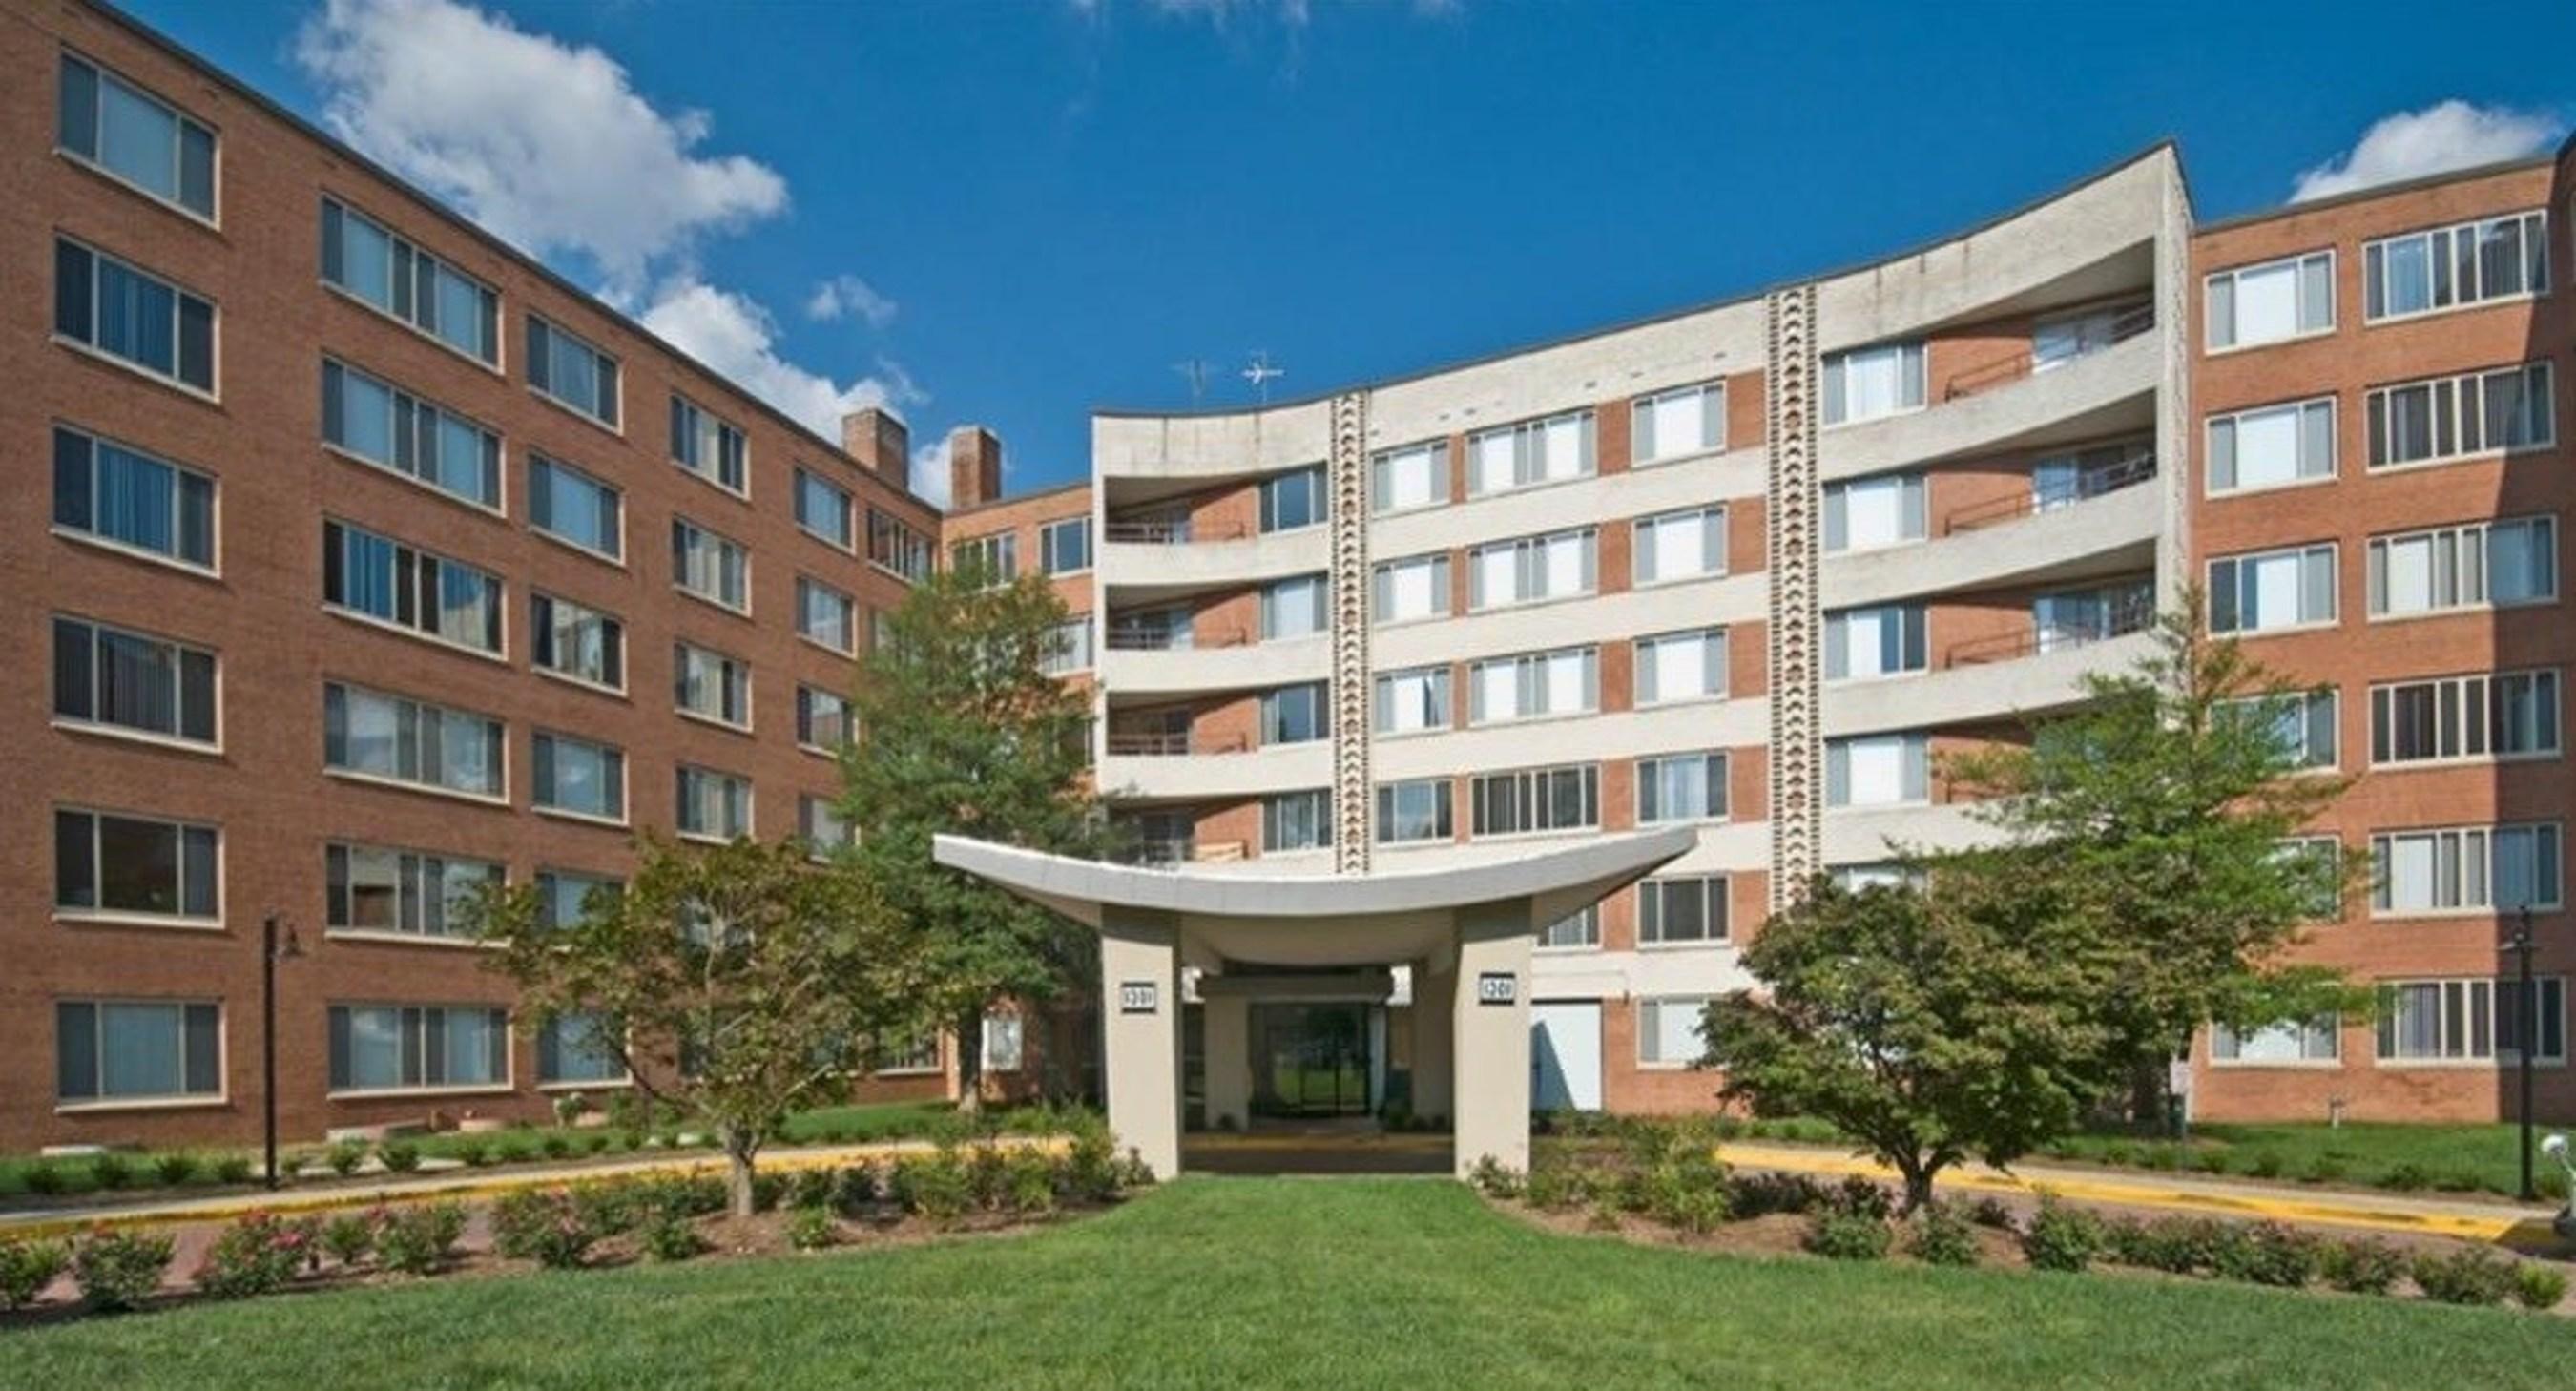 Washington REIT Acquires Multifamily Community On Columbia Pike In Arlington, VA